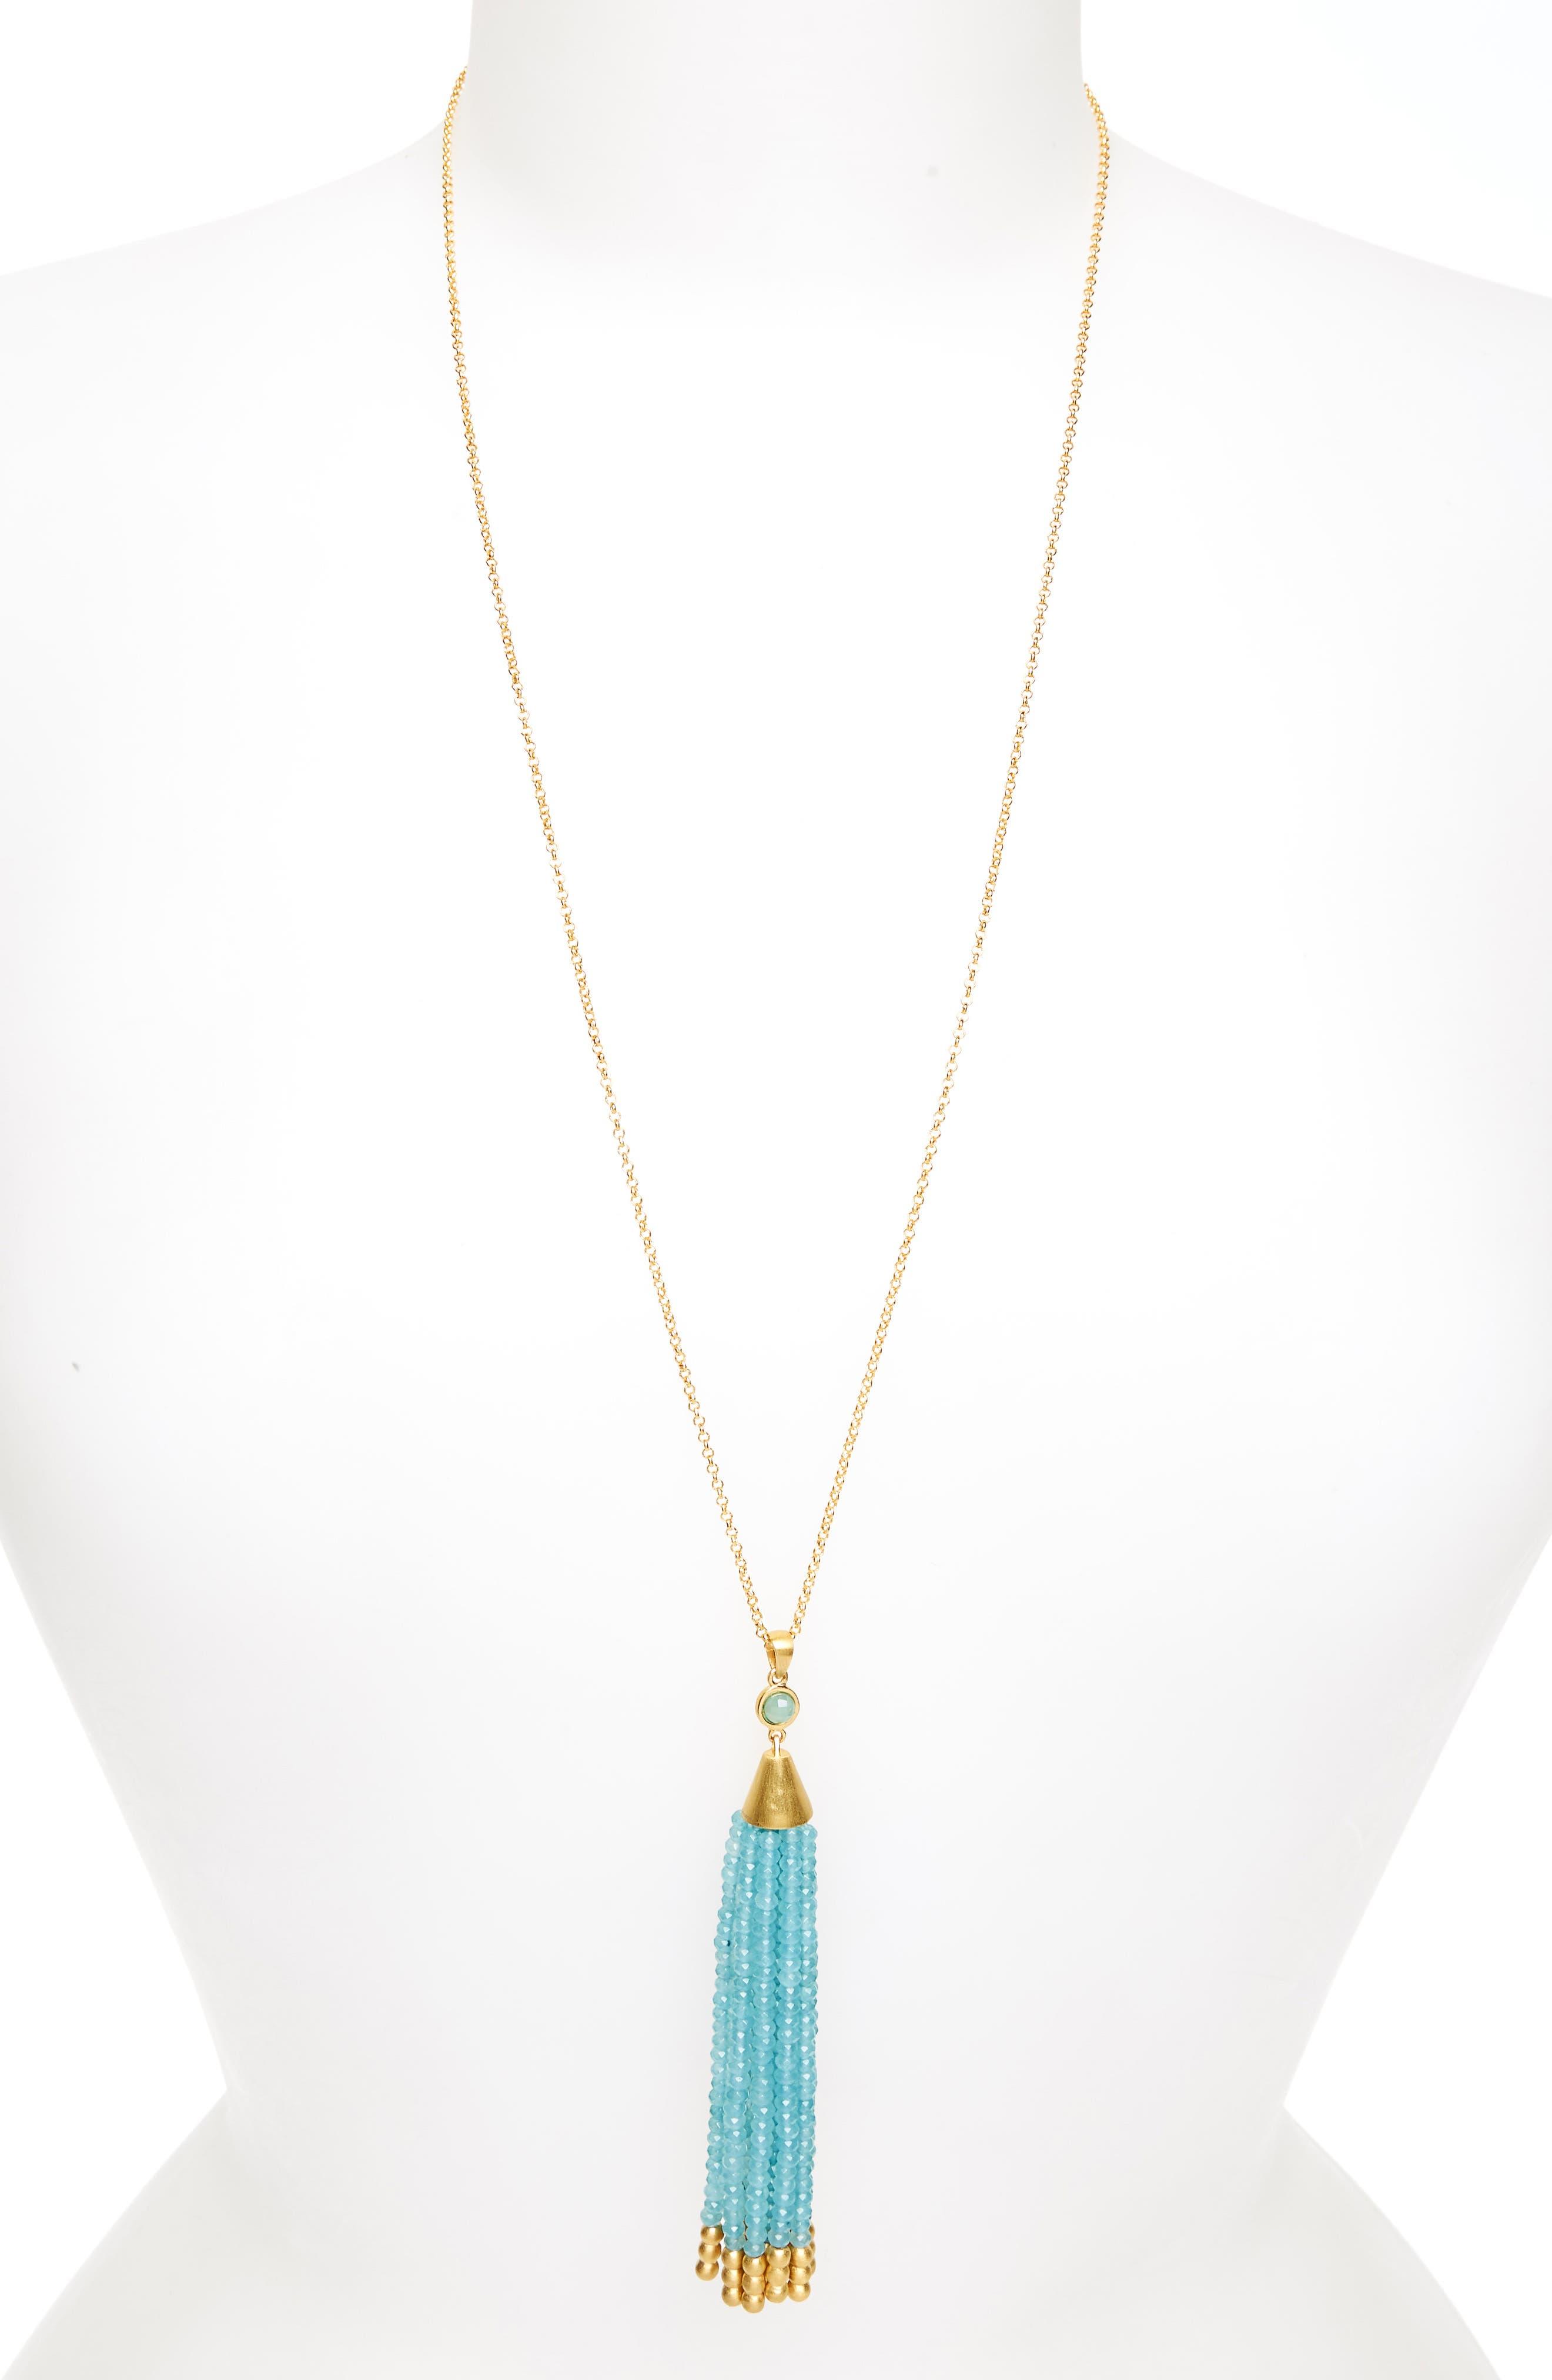 Samba Tassel Pendant Necklace,                             Main thumbnail 1, color,                             Ocean Blue Chalcedony/ Gold